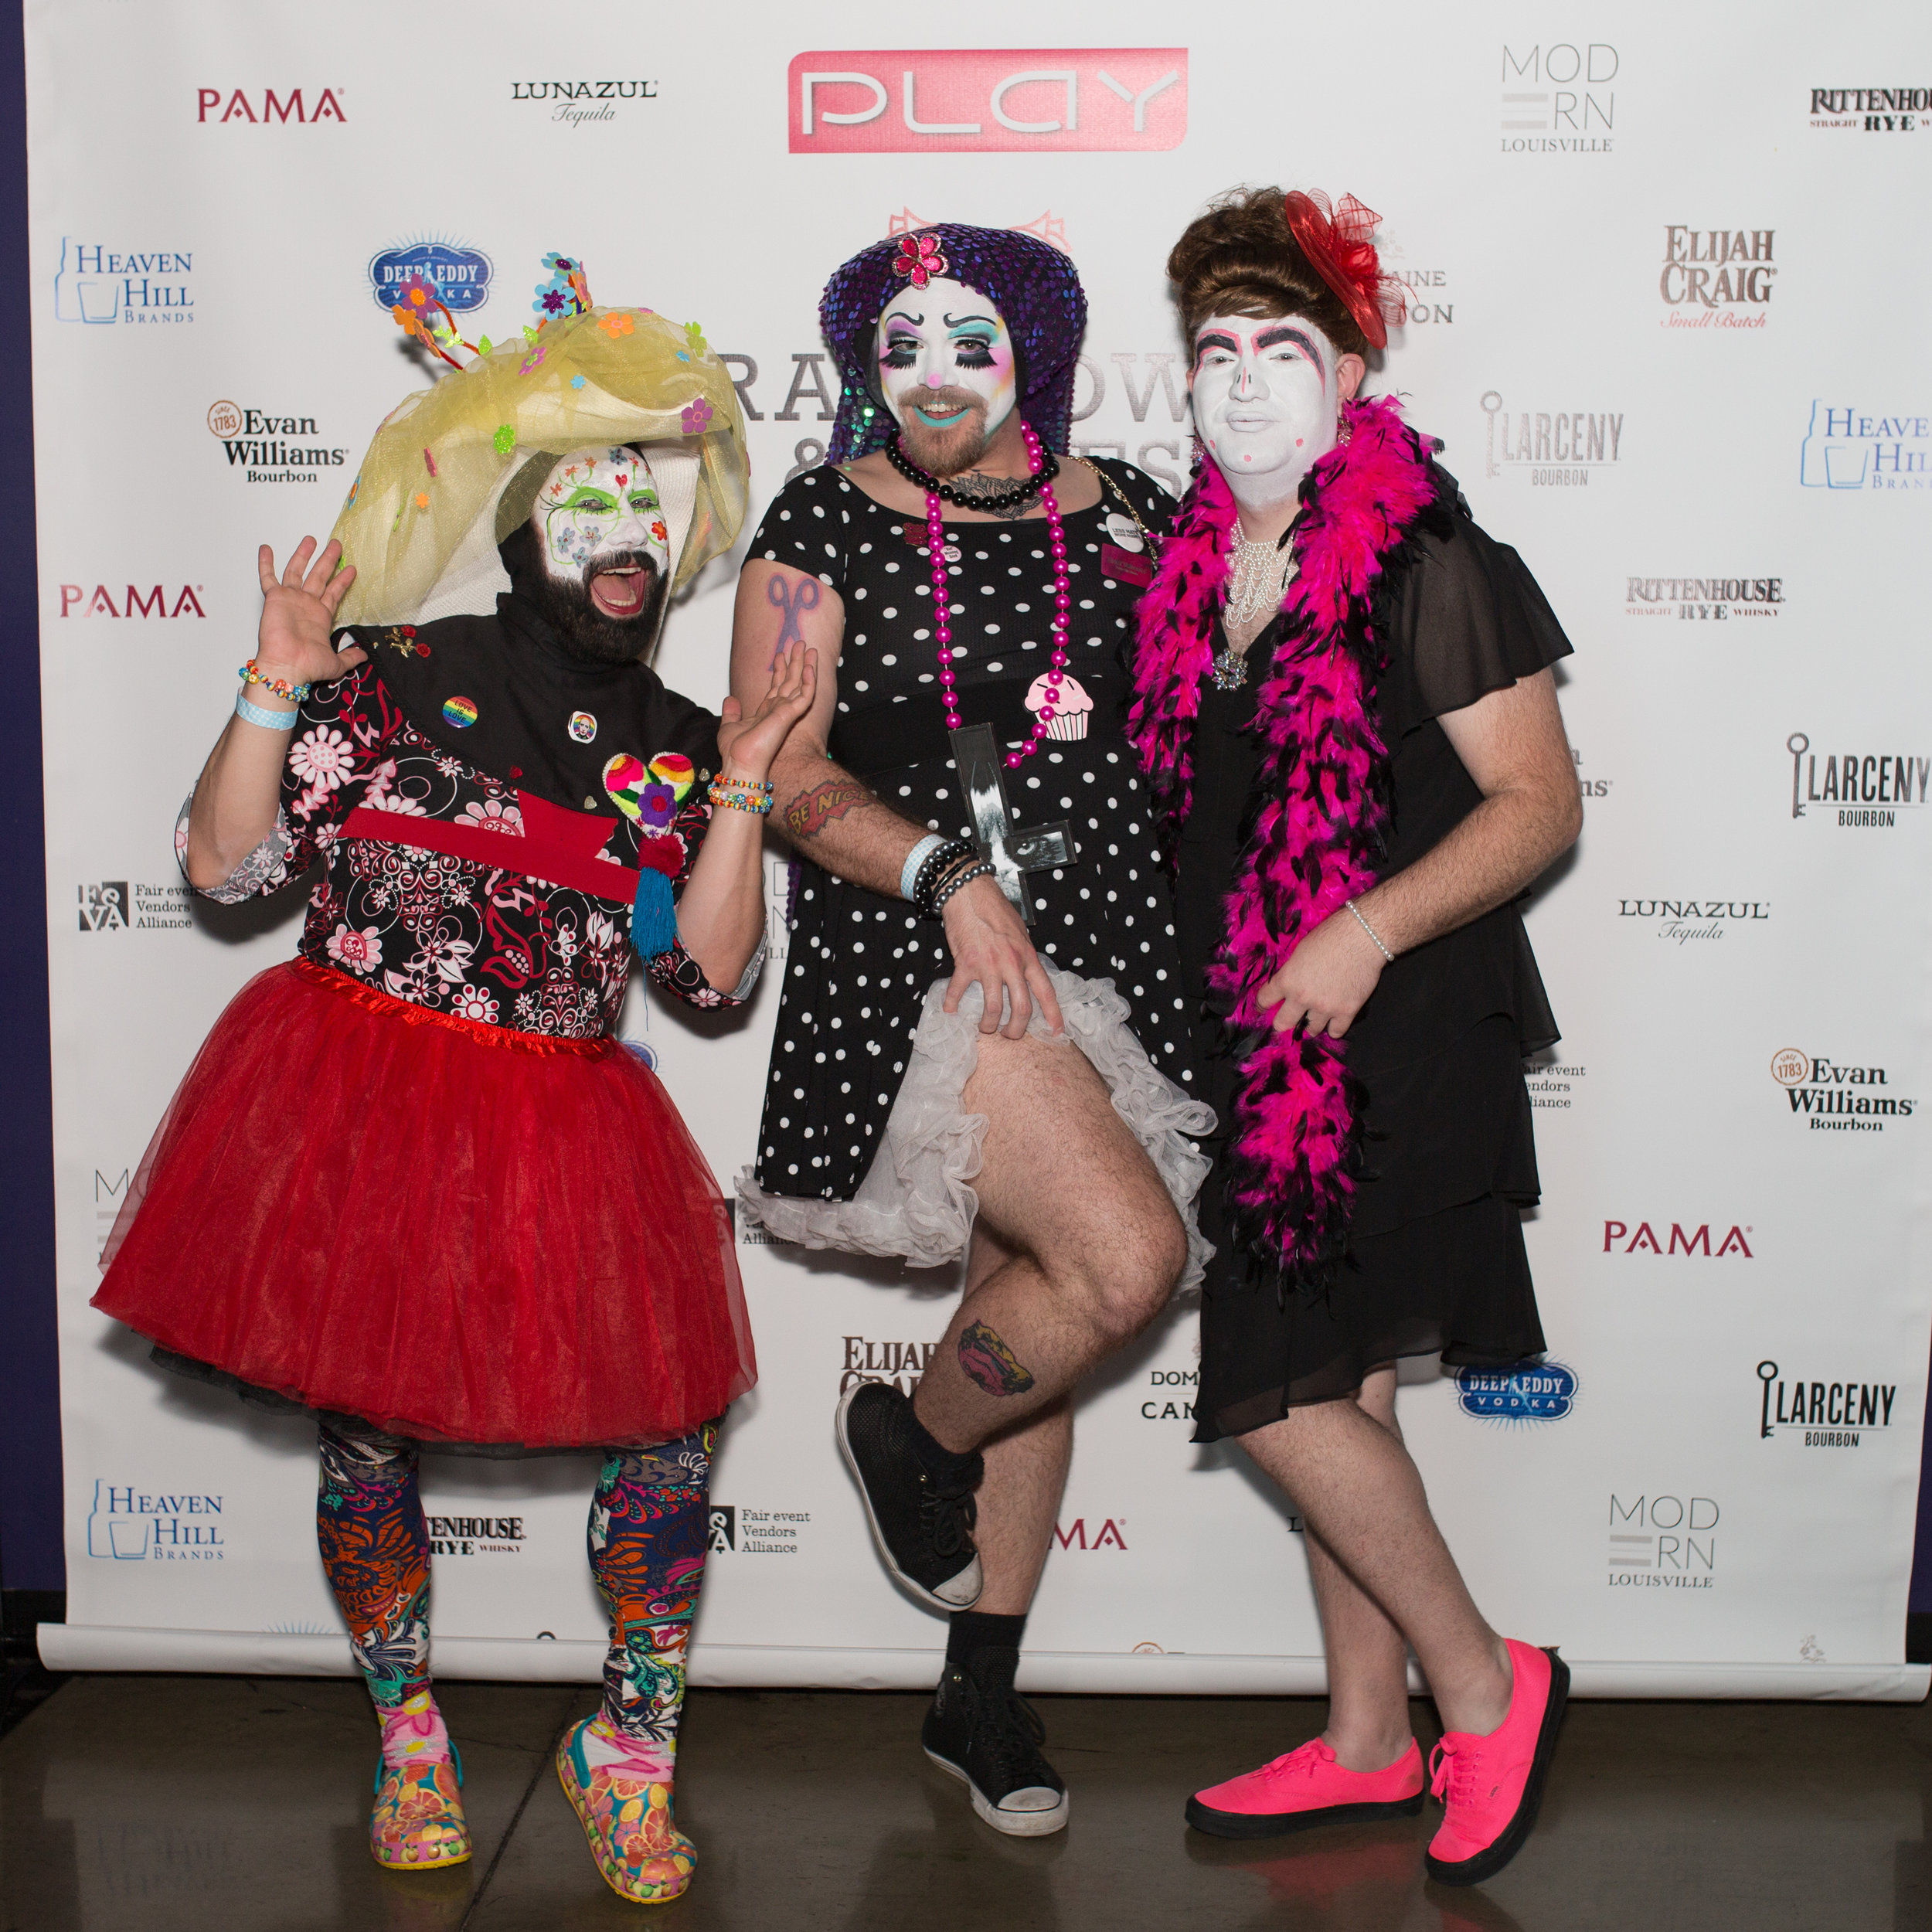 Rainbows & Roses Thurby 2017 WEBSITE FEVA PLAY Crystal Ludwick Photo 20.jpg